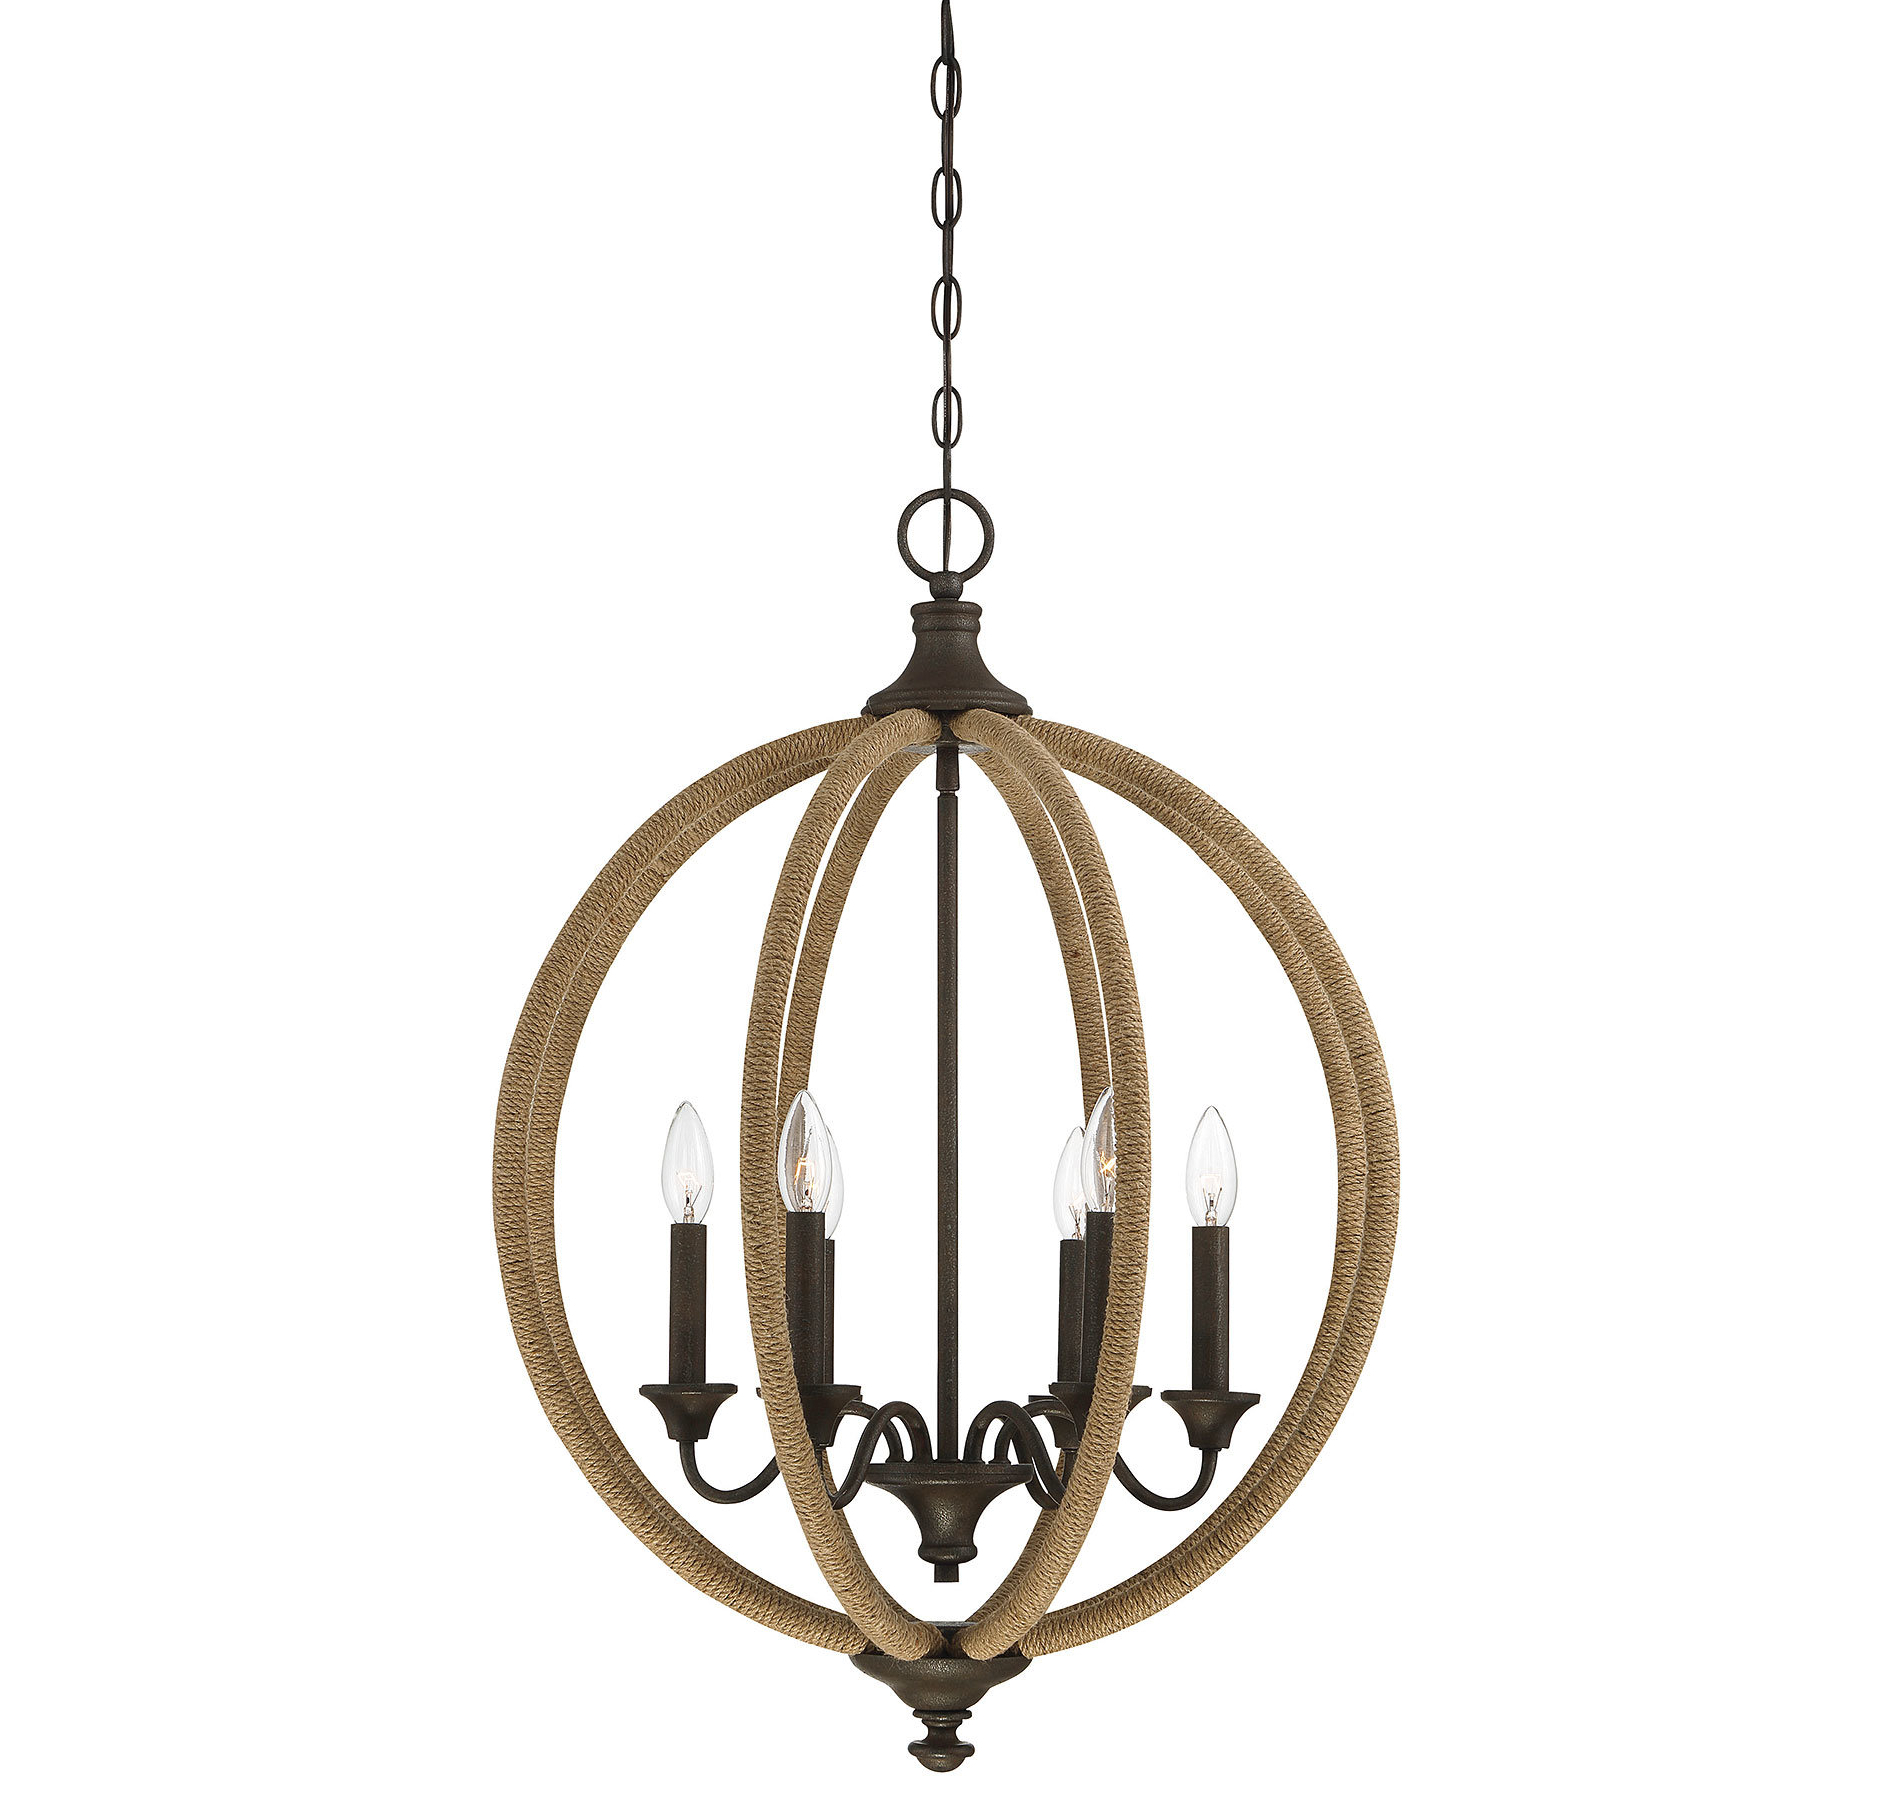 Georgianna 6 Light Globe Chandelier With Regard To Best And Newest Filipe Globe Chandeliers (Gallery 17 of 20)